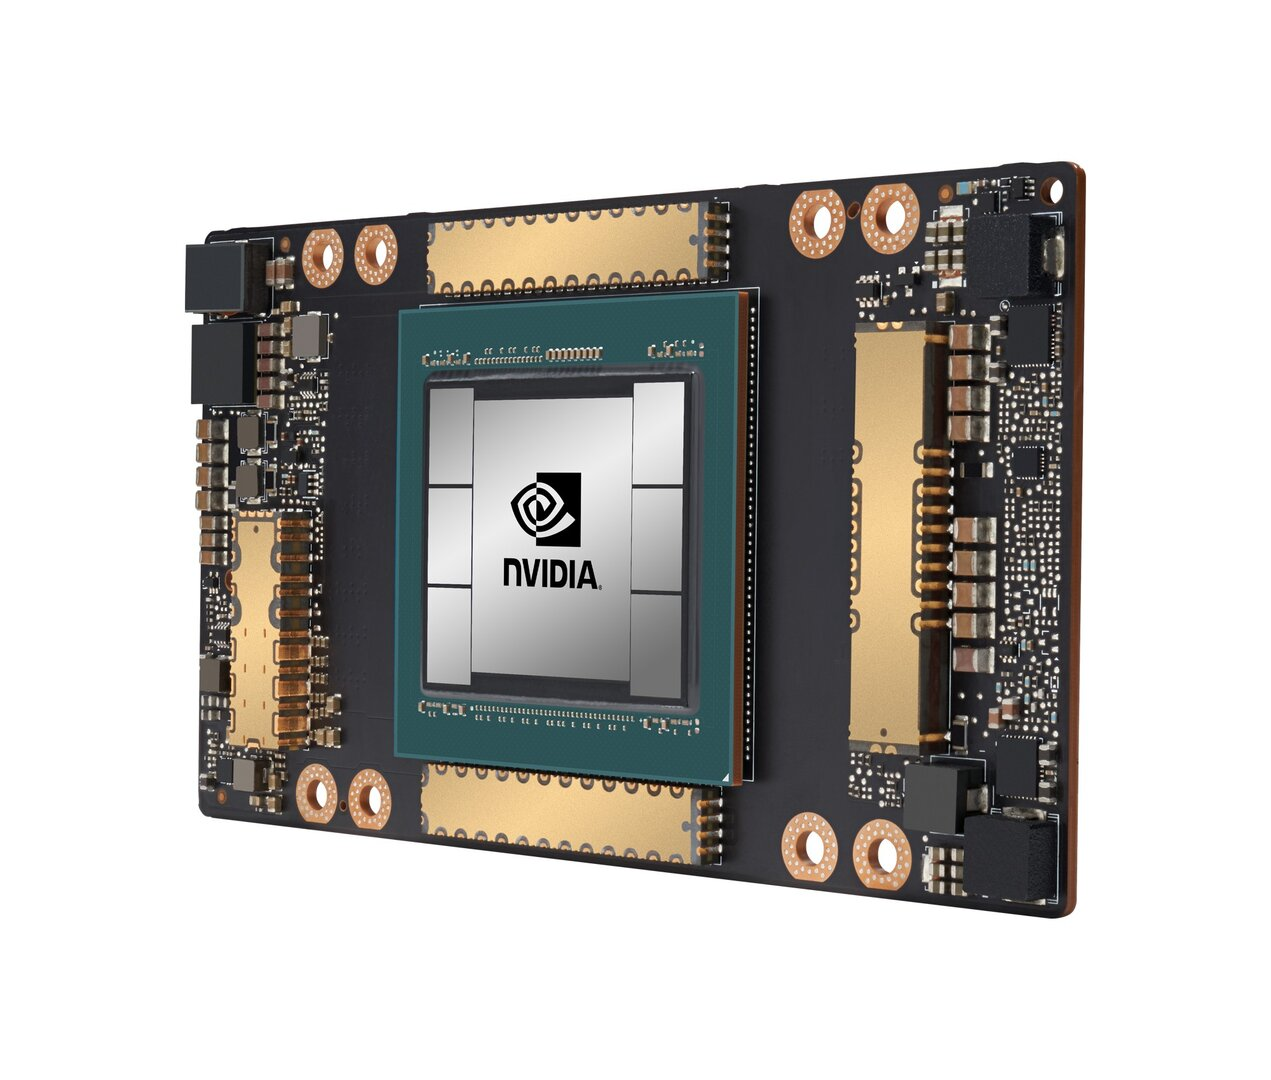 SXM4-Modul mit A100-GPU im Detail